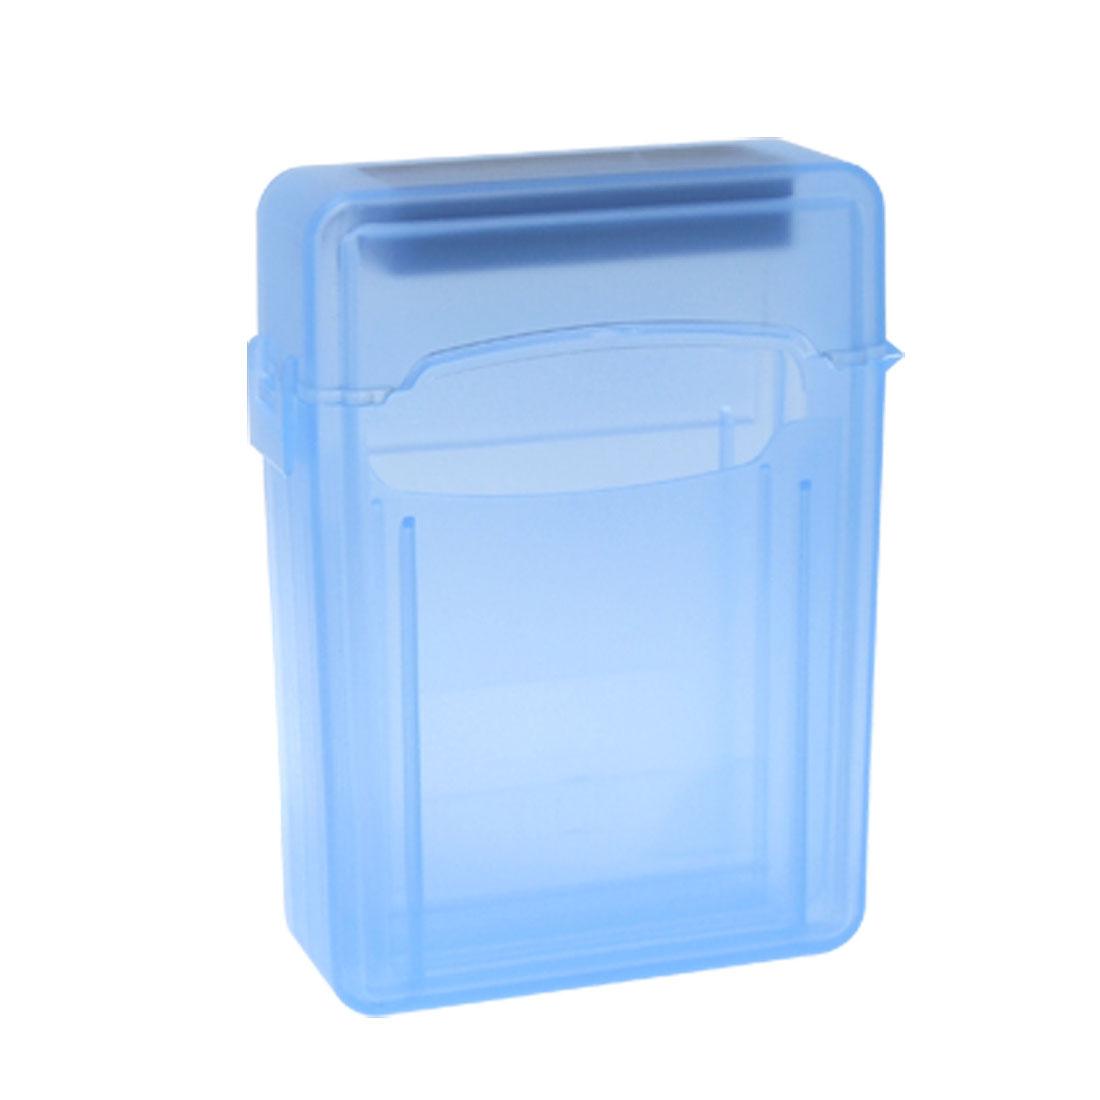 2.5 Inch IDE Hard Drive Enclosure External Case Storage Box Blue